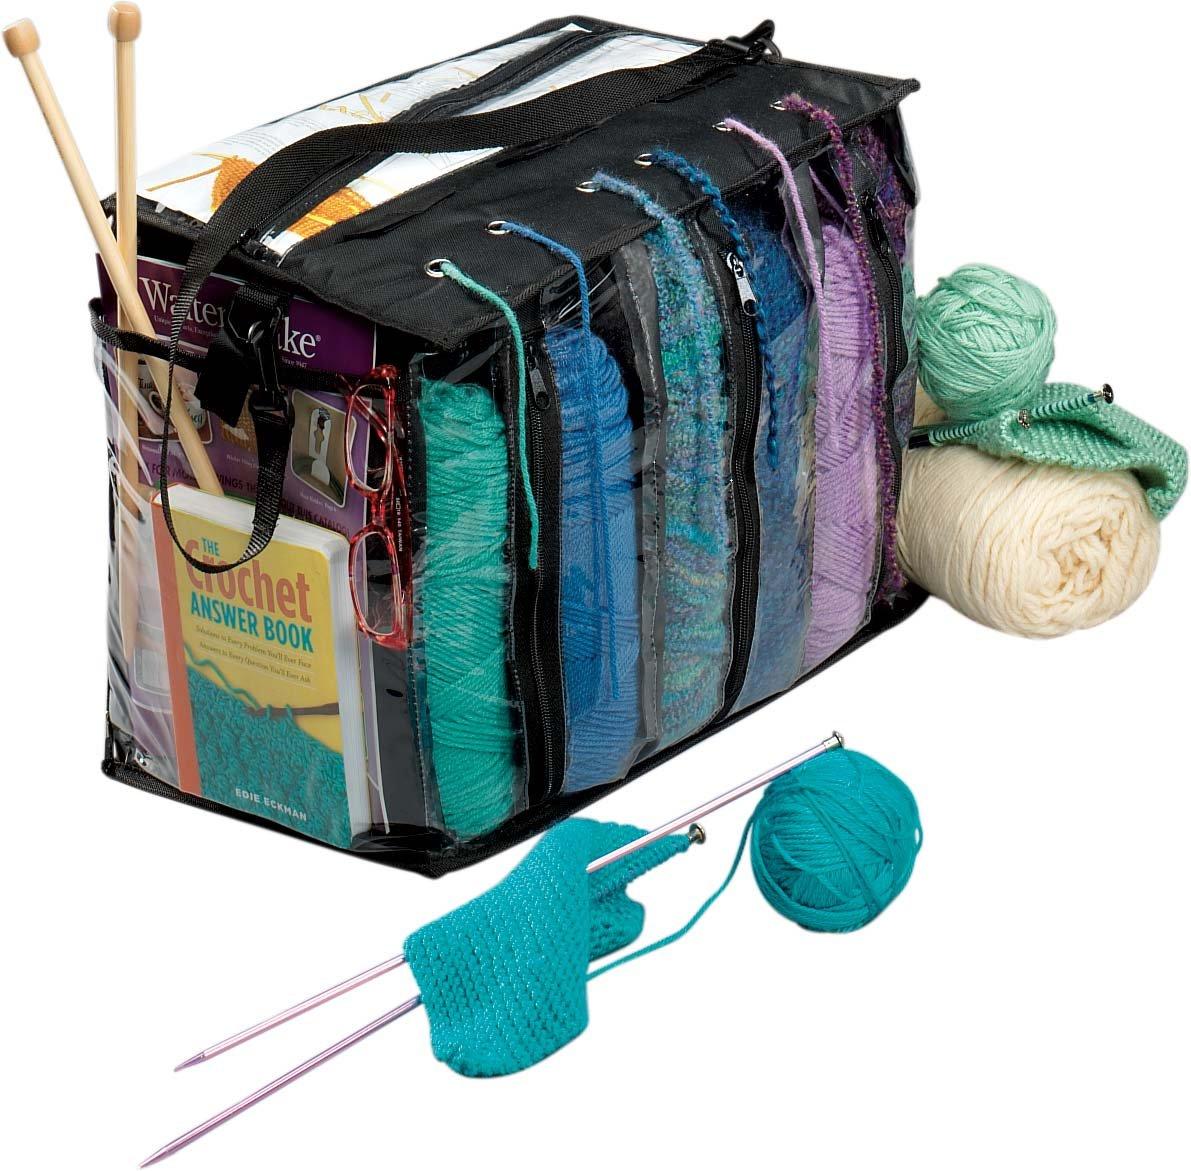 Knitting Yarn Holder Bag : Knitting tote bag skein yarn holder crocheting supply